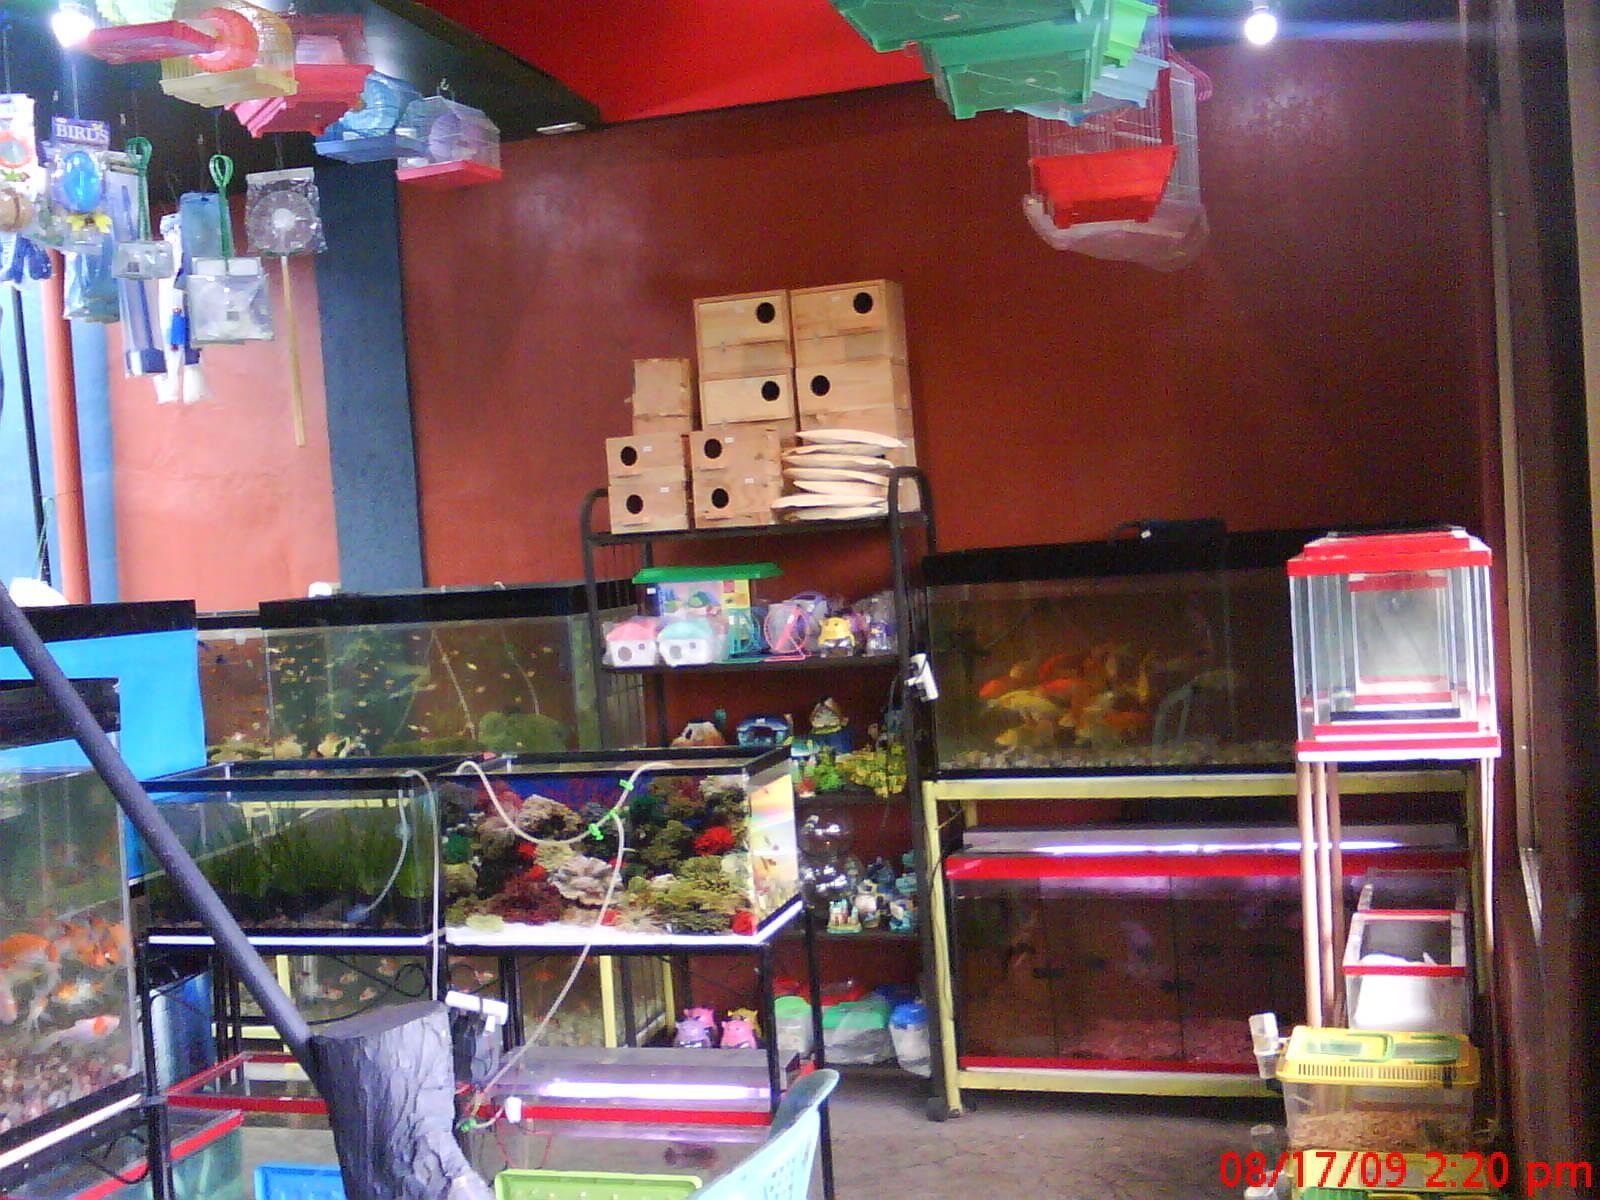 treetop garden petshop  Decor, Pet shop, Home decor